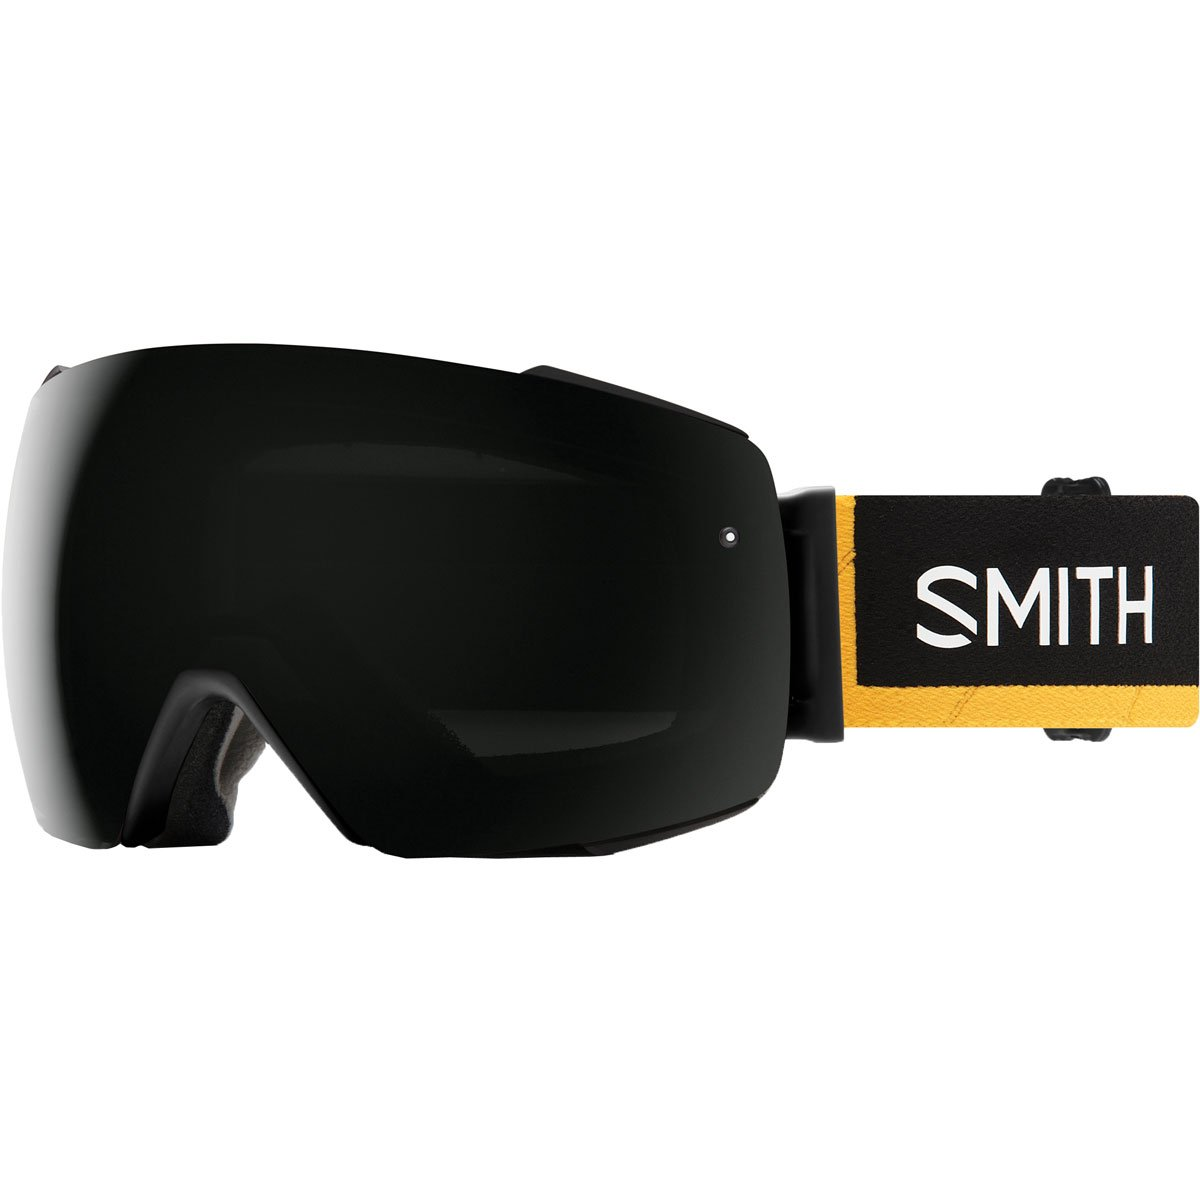 Smith Optics Io Mag - Ac Adult Snow Goggles - Ac - Austin Smith X The North Face/Chromapop Sun Black/One Size